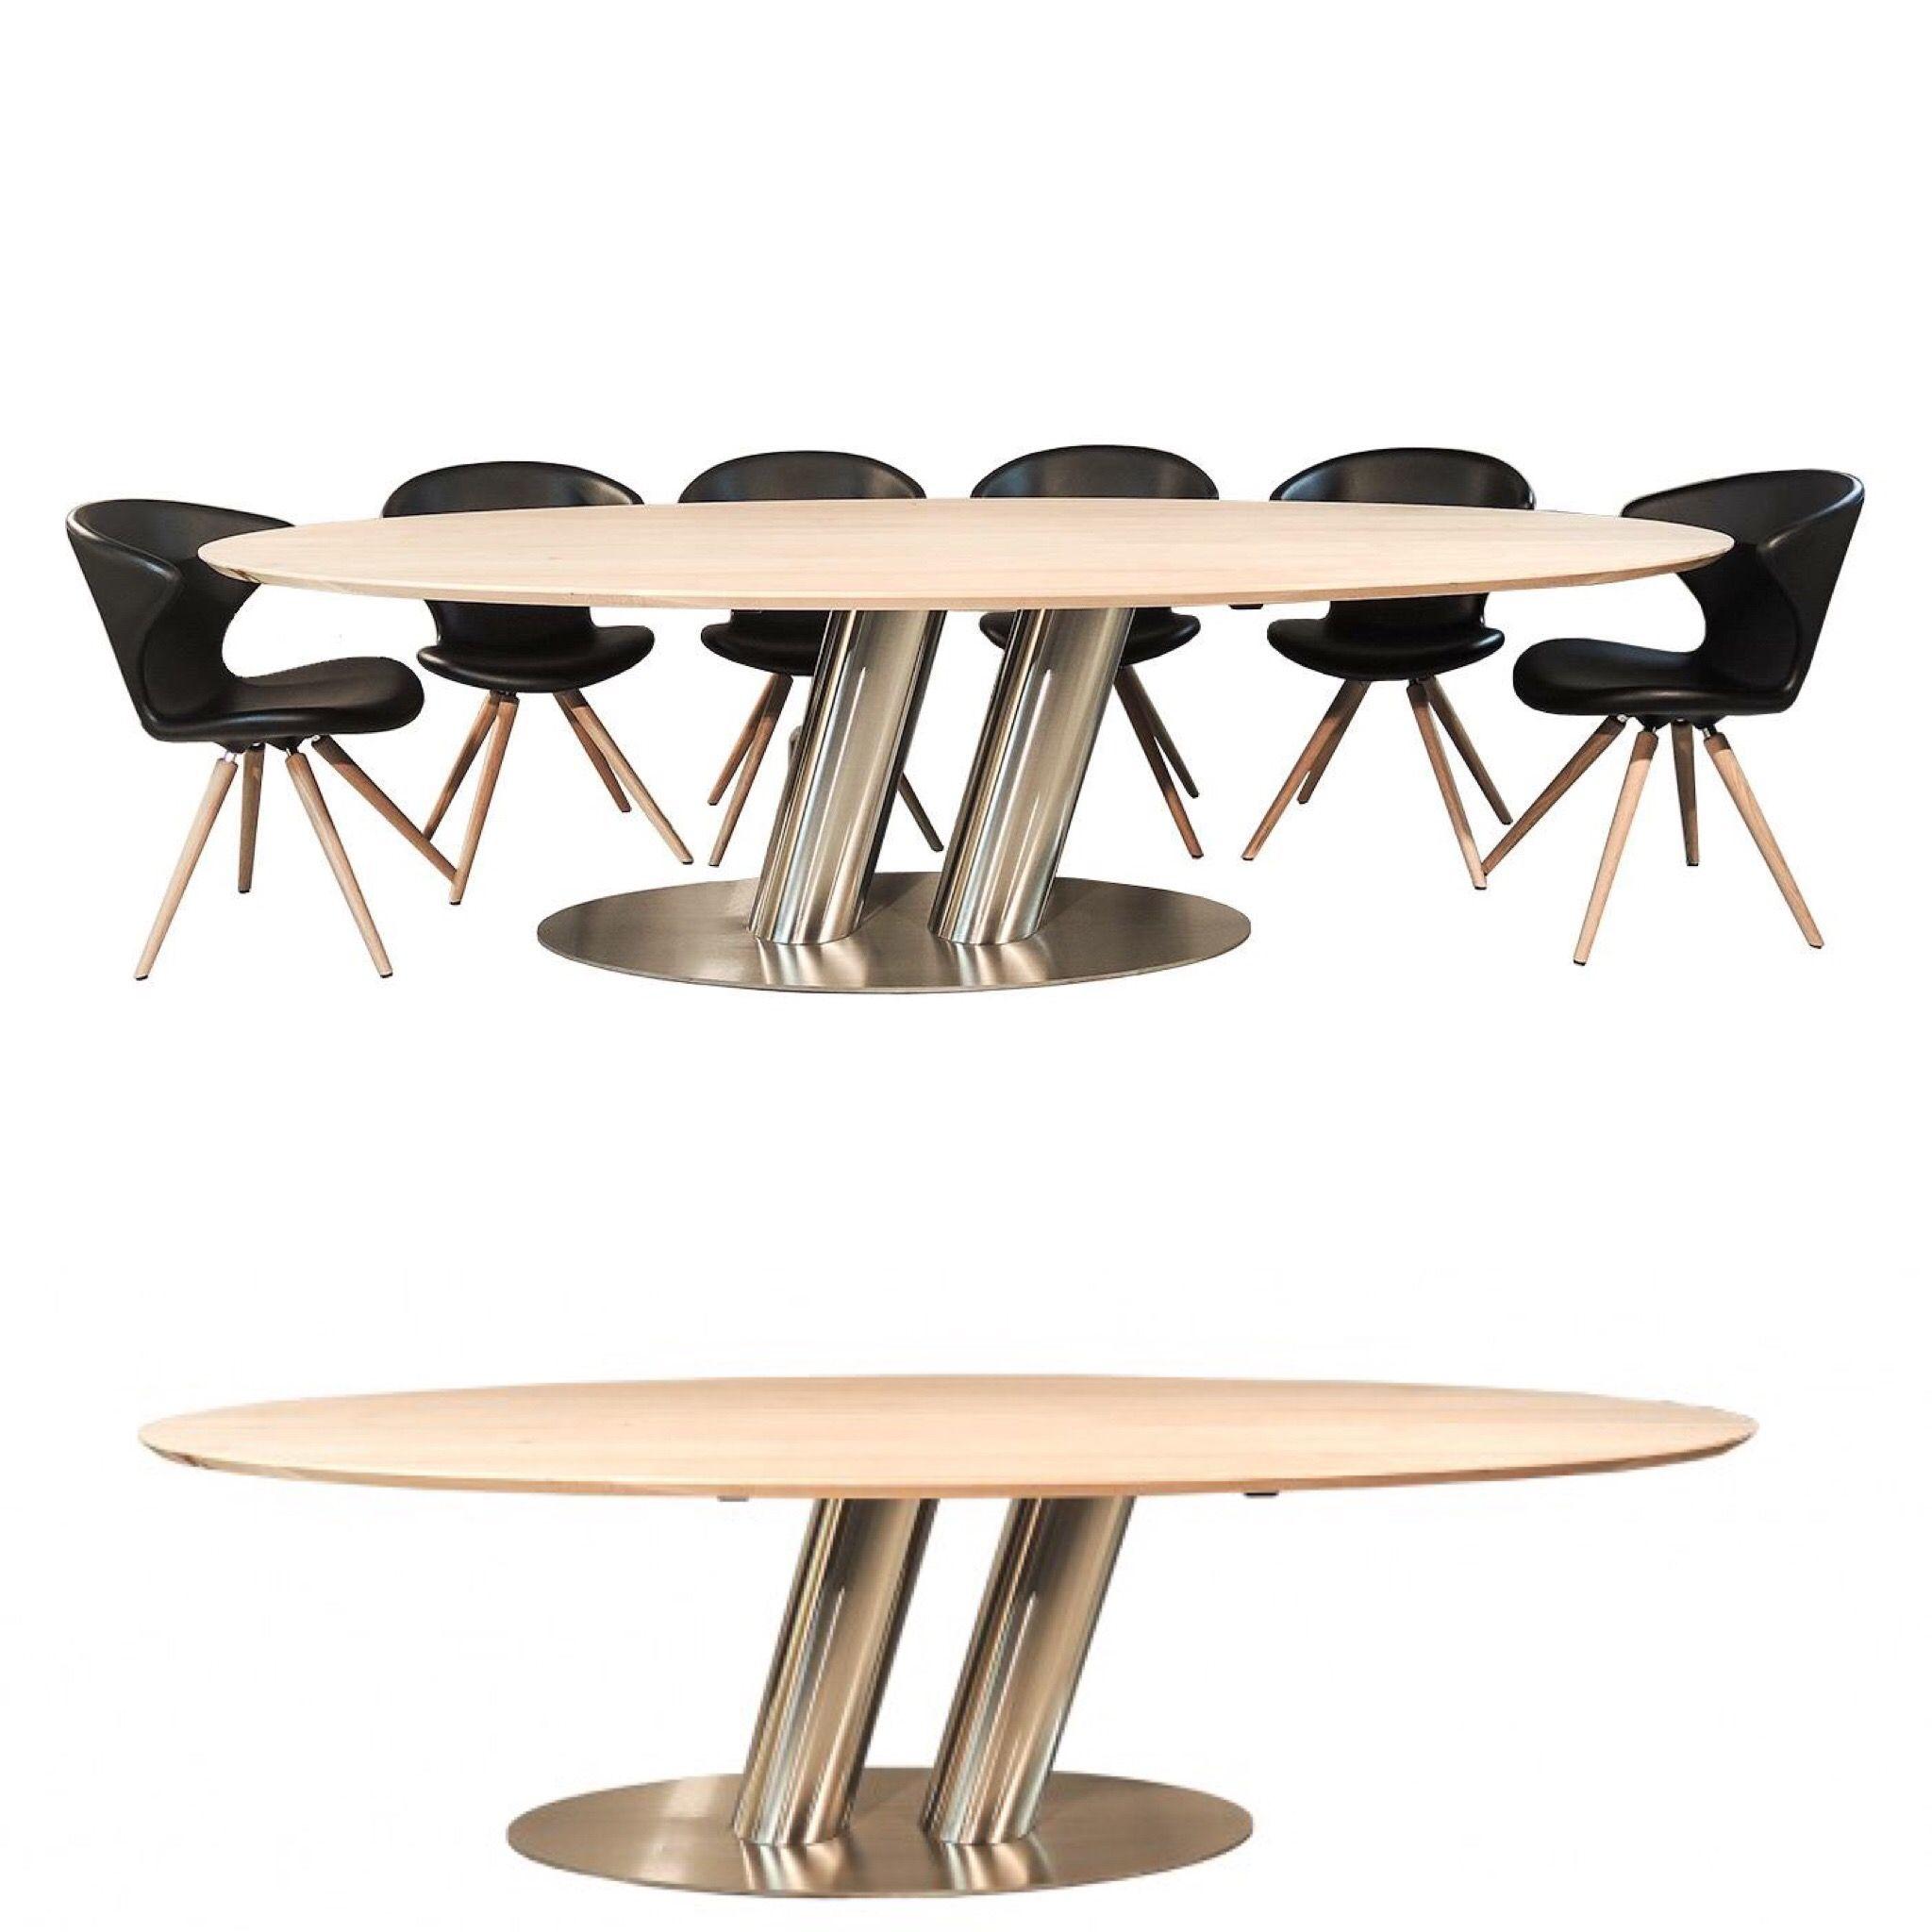 Ovaal design rvs lokaal vakmanschap madeinfriesland for Design tafel ovaal